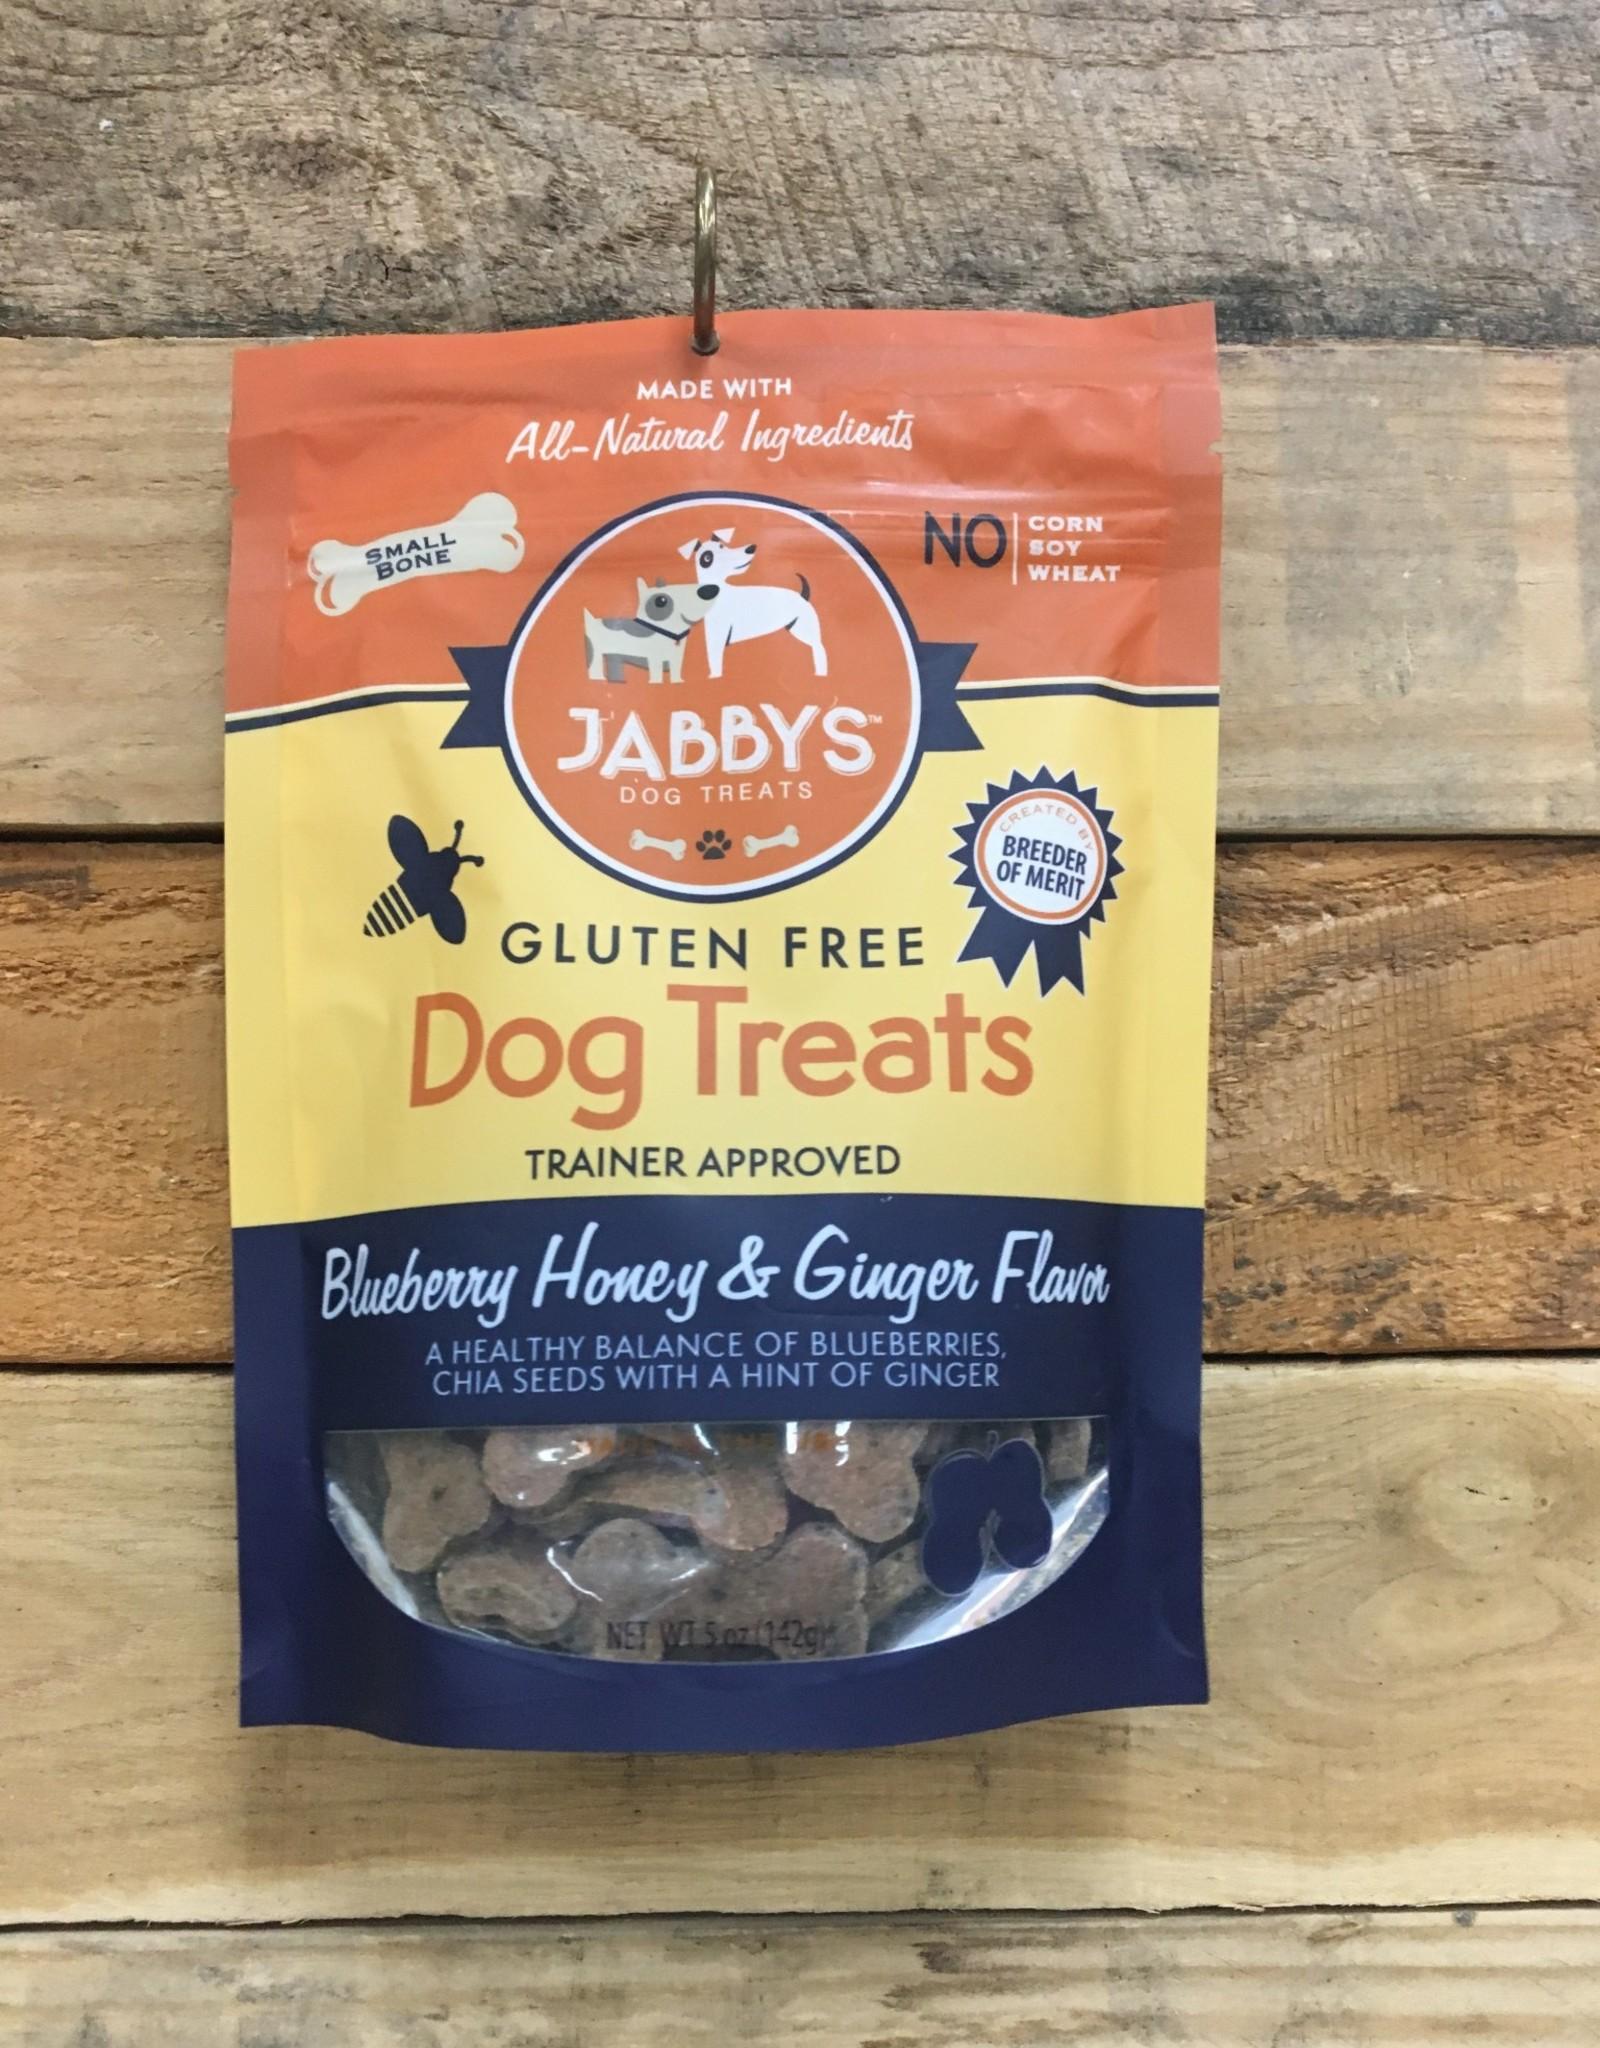 Jabbys Blueberry honey/ginger dog treats